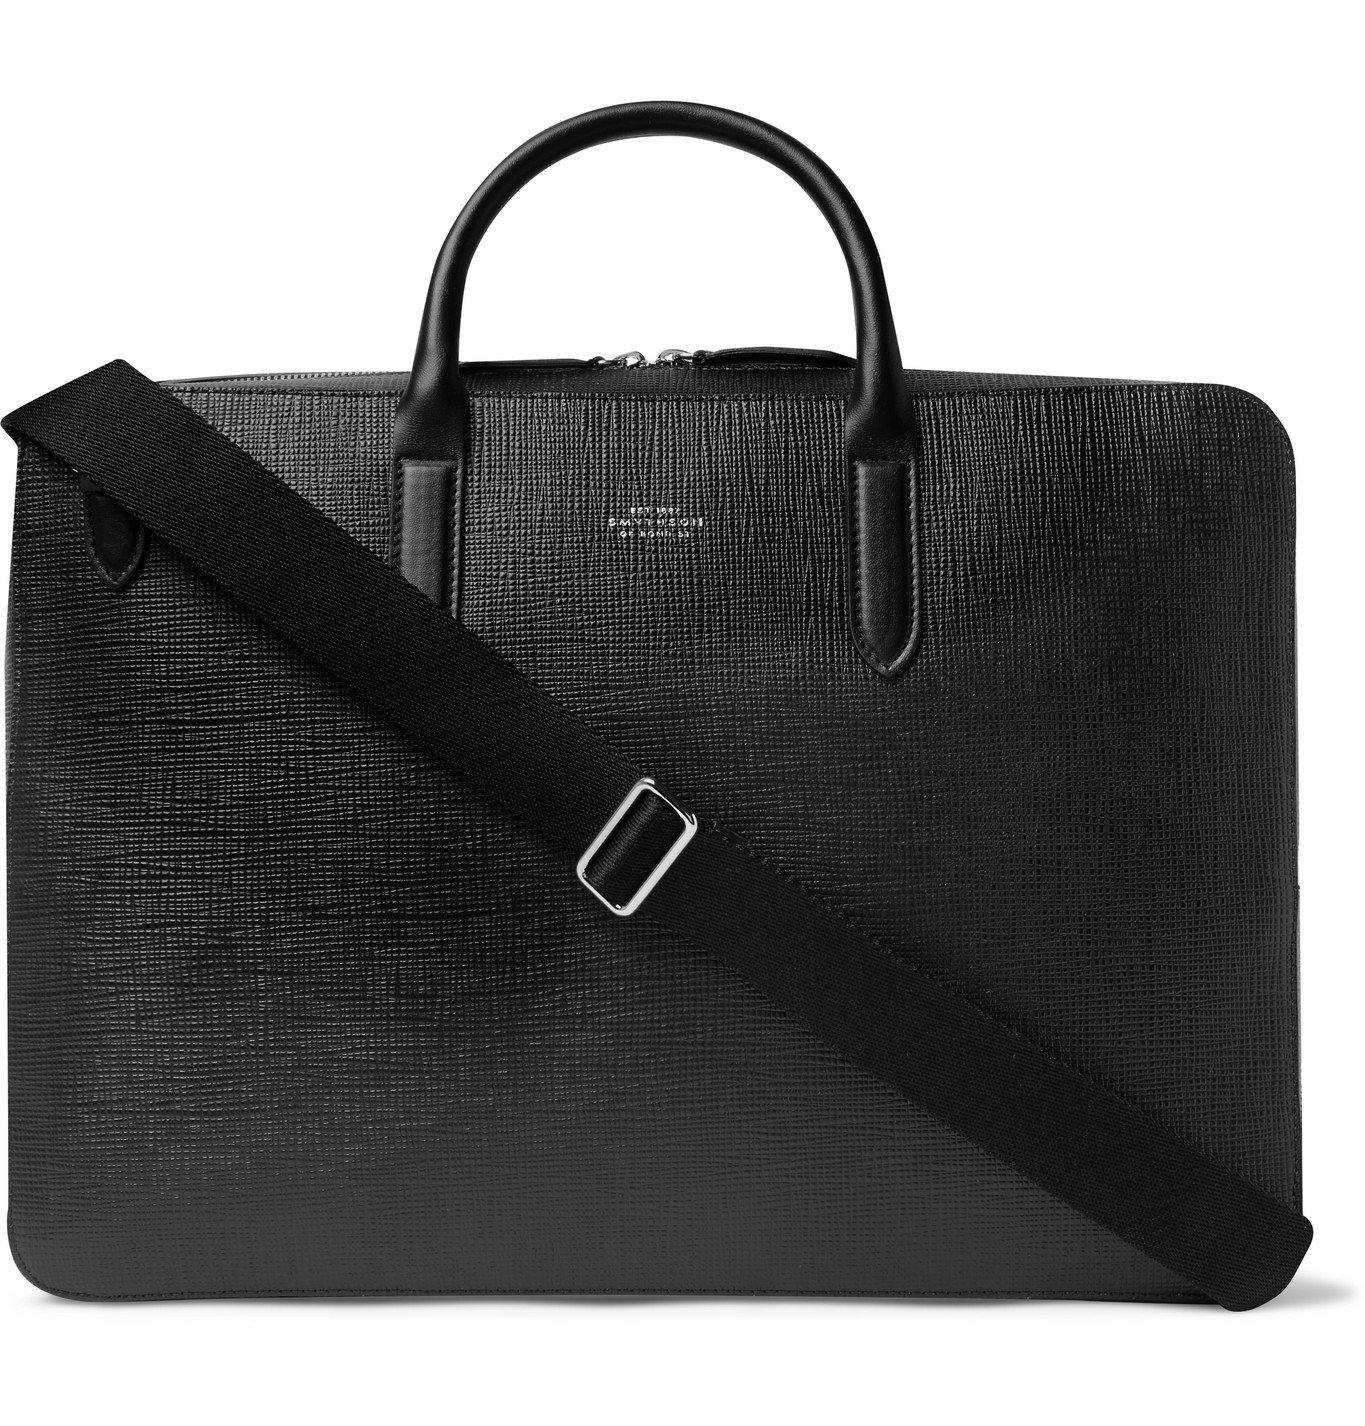 Smythson - Panama Cross-Grain Leather Briefcase - Black